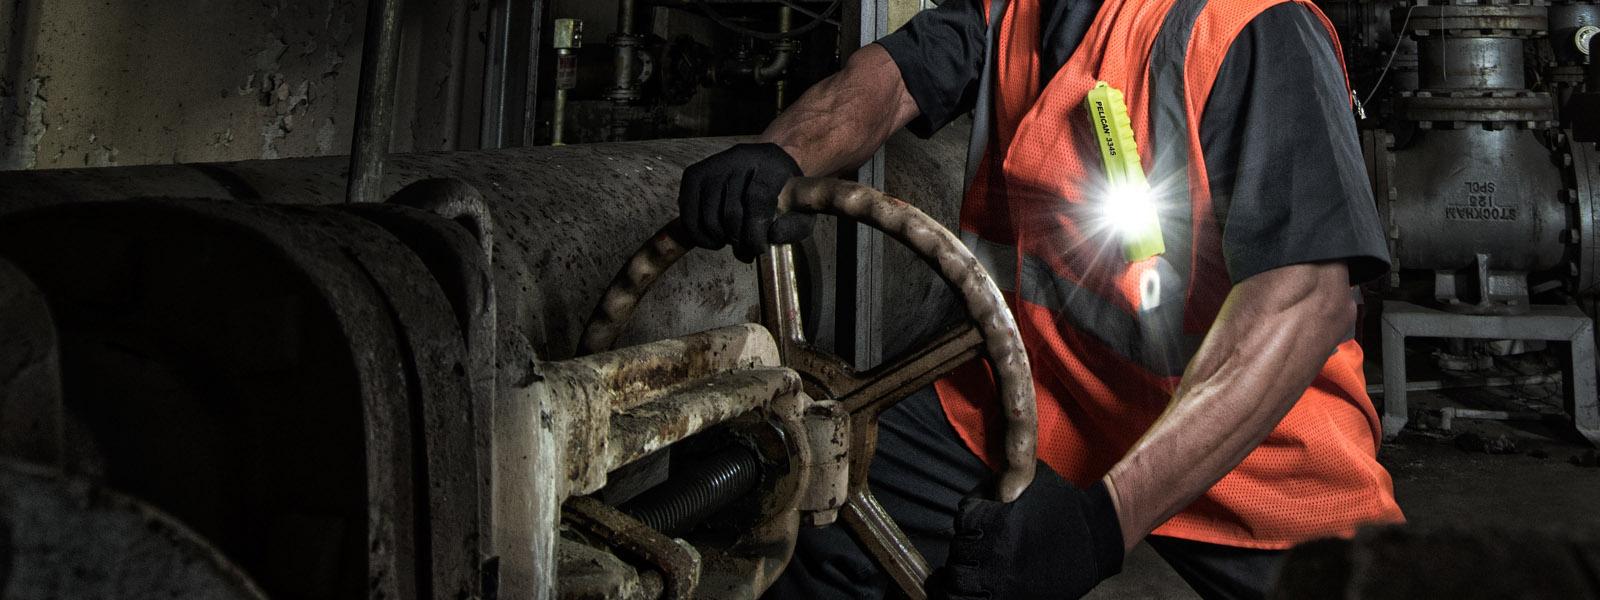 pelican 3345 flashlight refinery